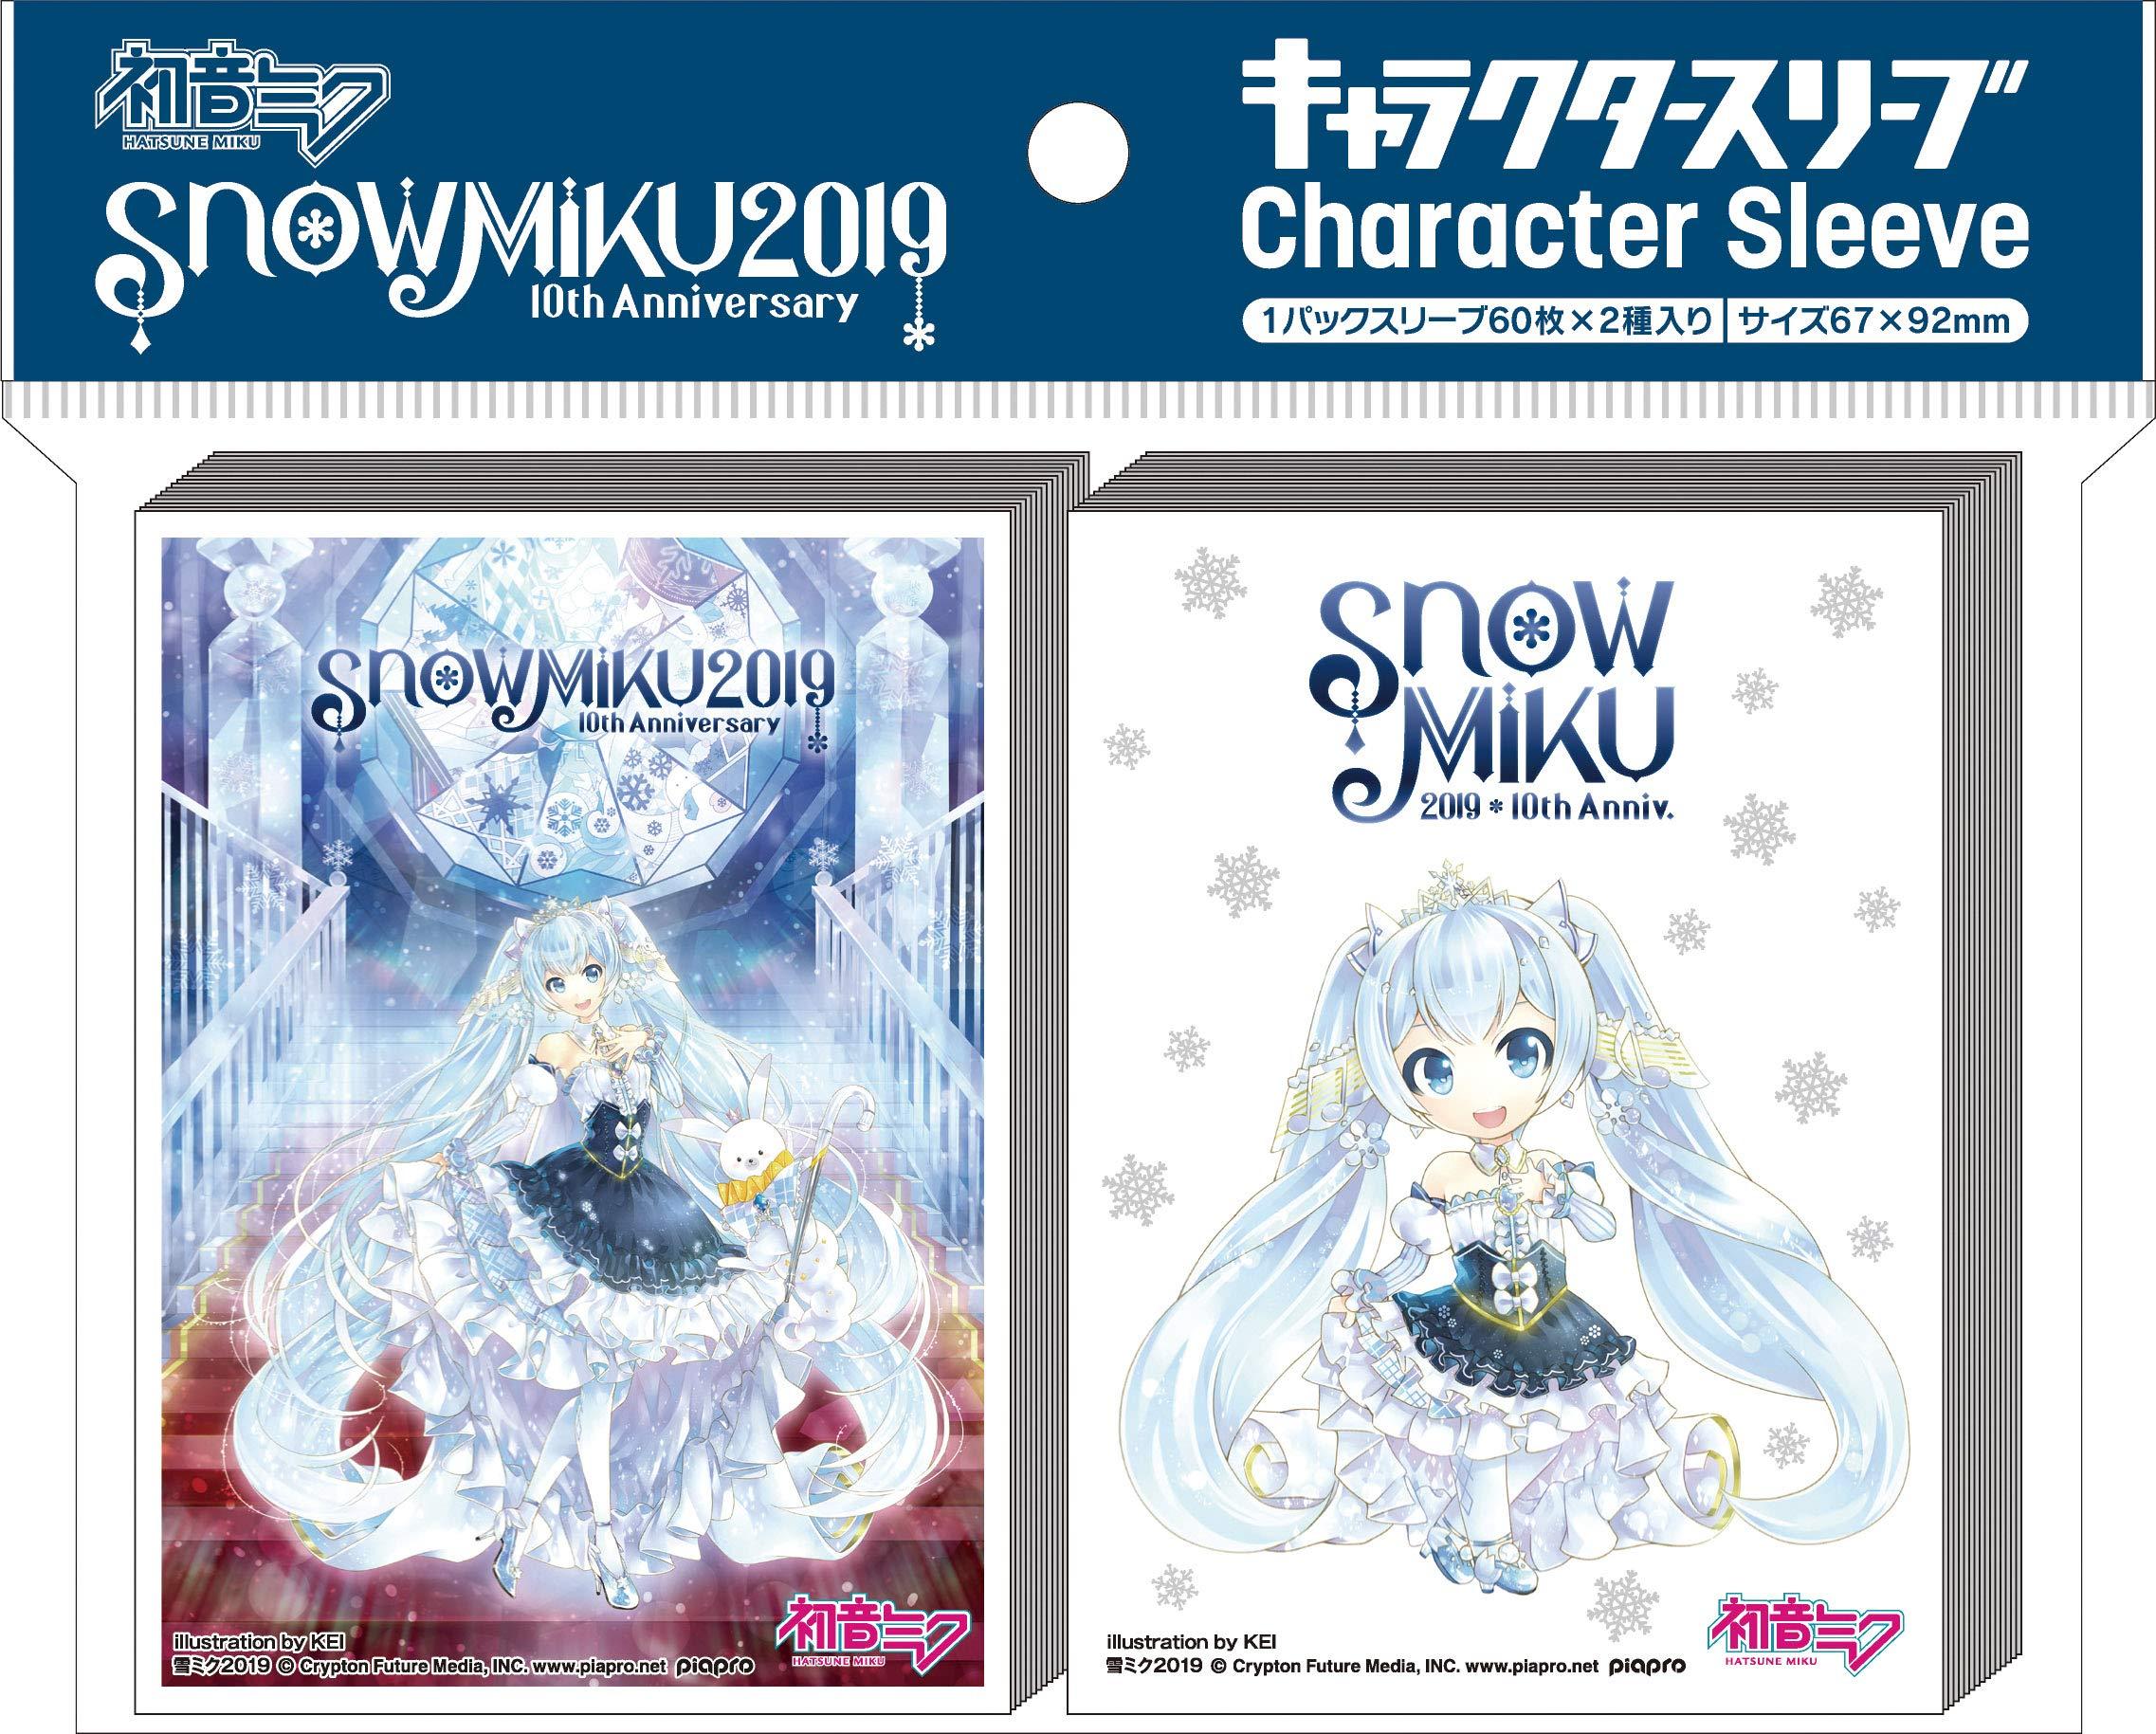 SNOW MIKU 2019 Character Sleeve SNOW MIKU 2019 (A) (EN-E001) Pack